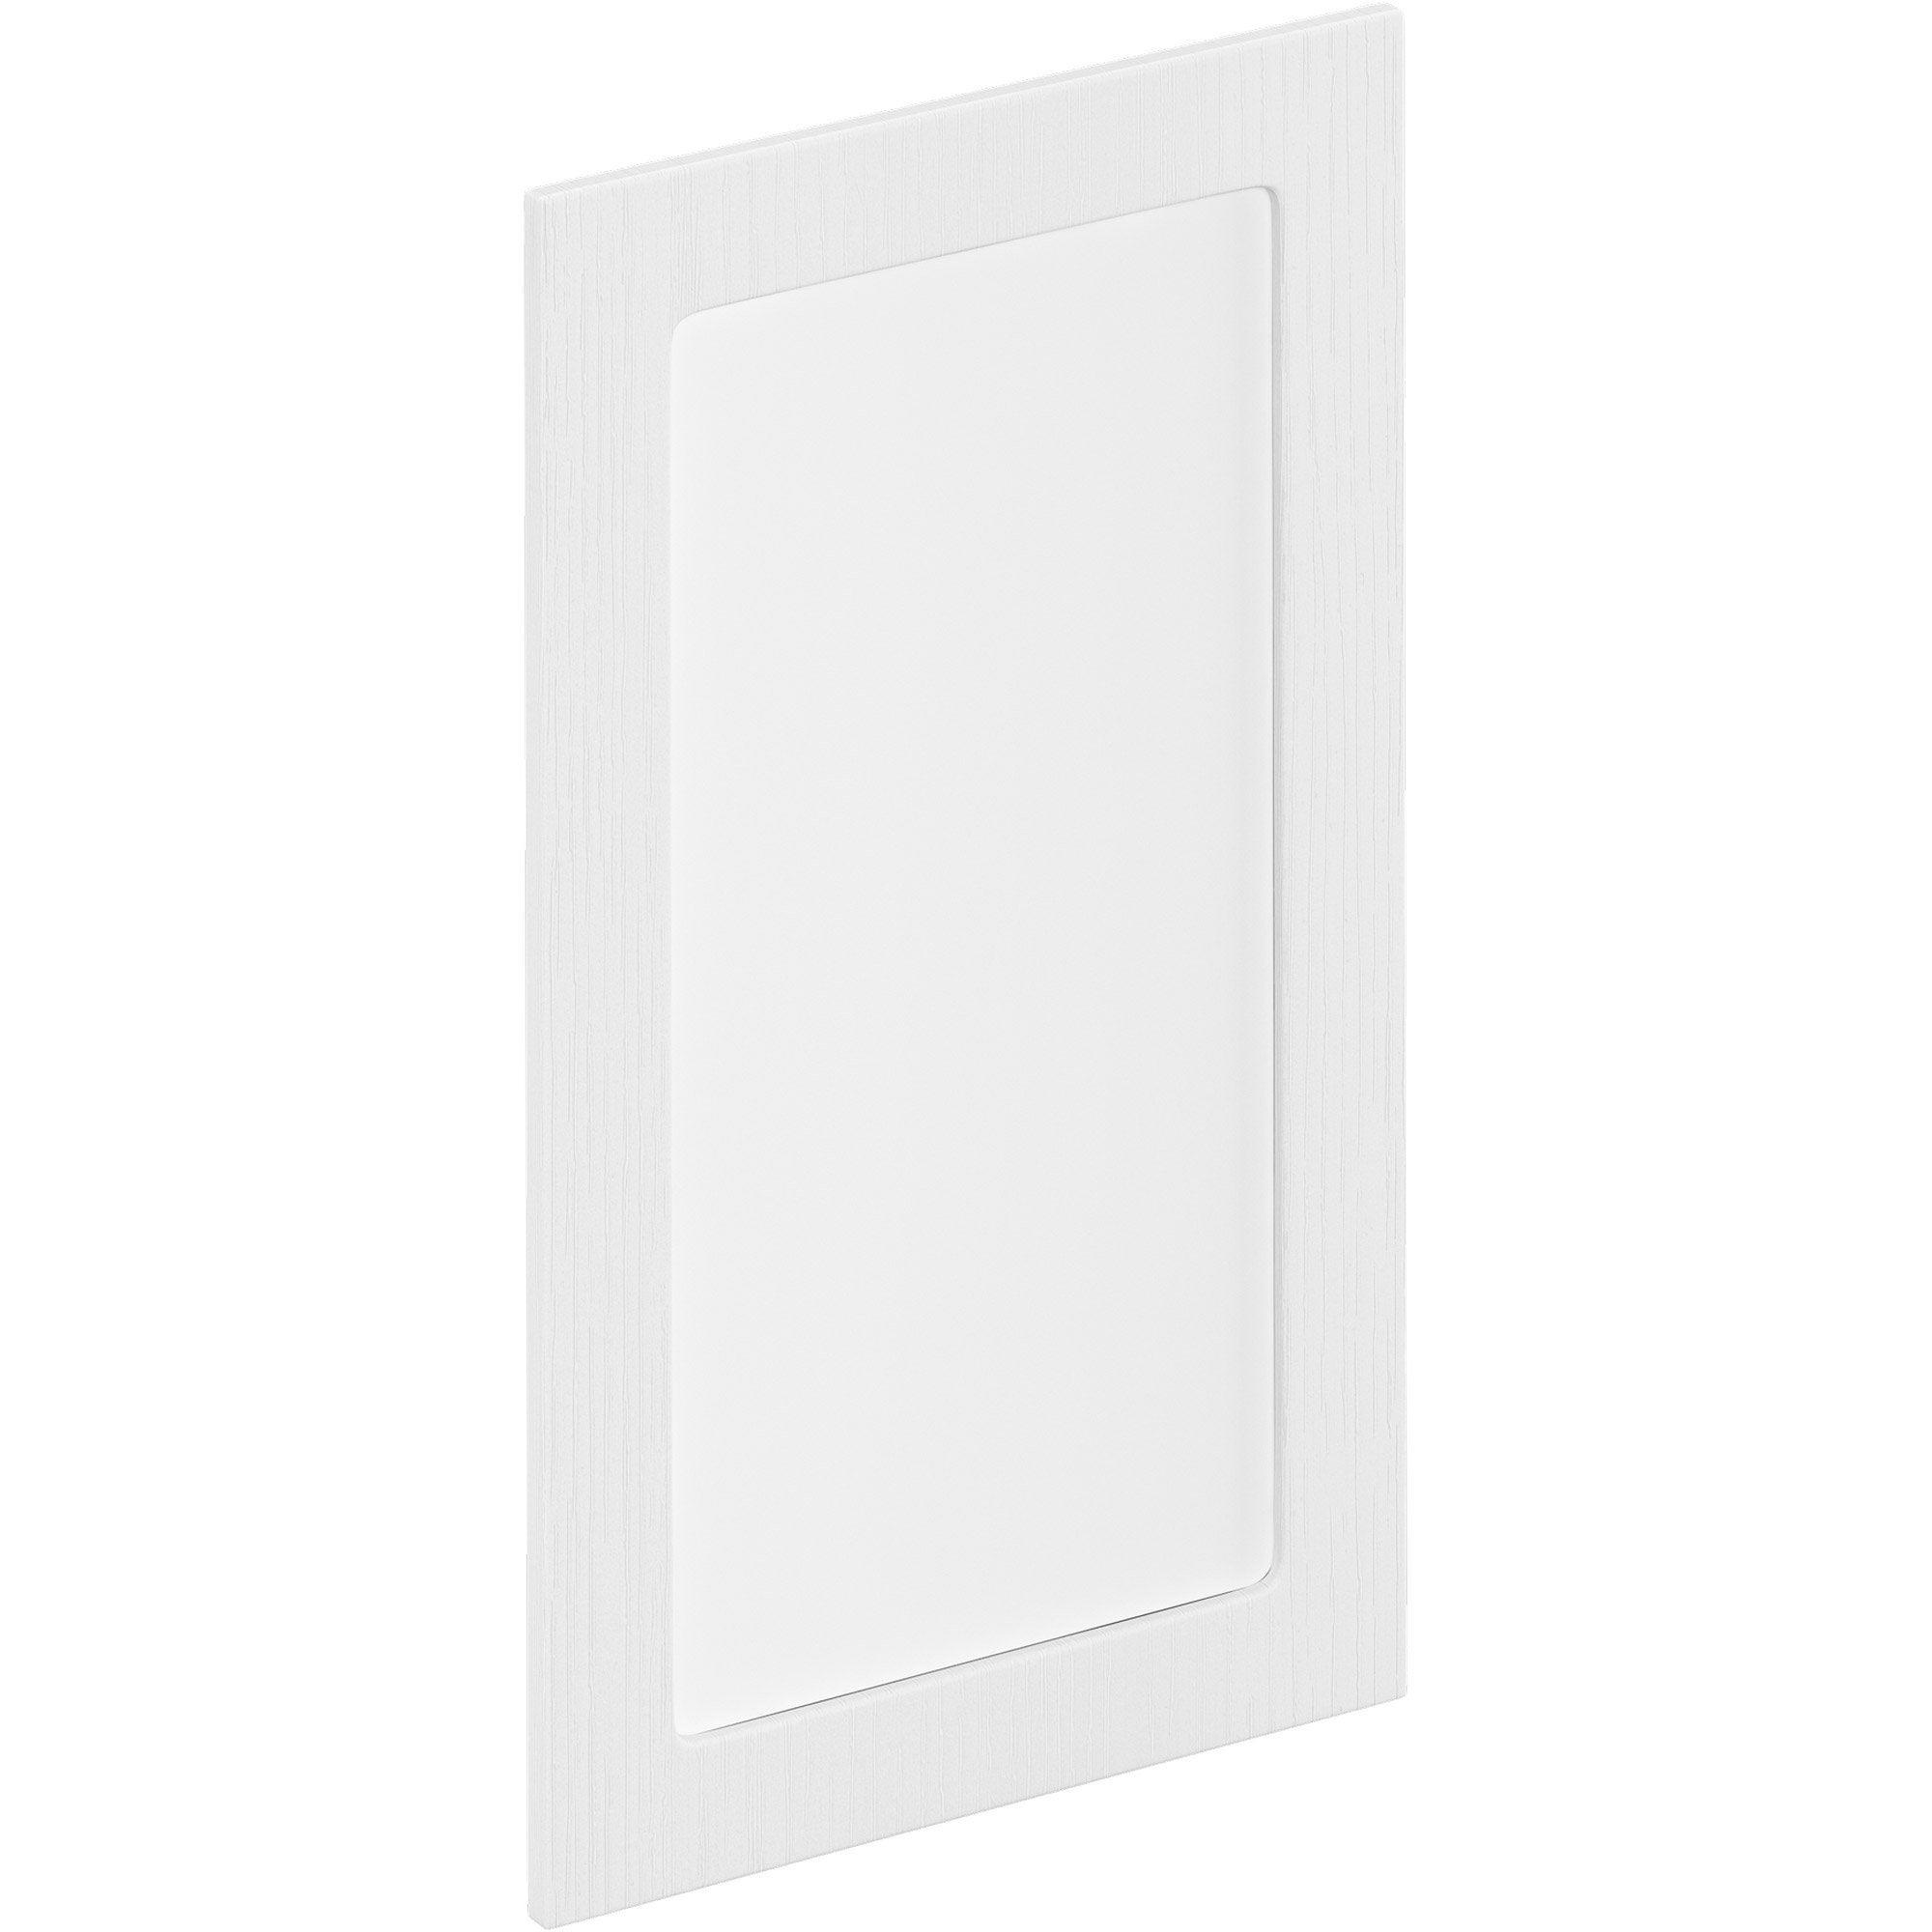 Porte de cuisine vitr e sevilla effet wood blanc delinia id x cm leroy merlin - Porte de cuisine vitree ...